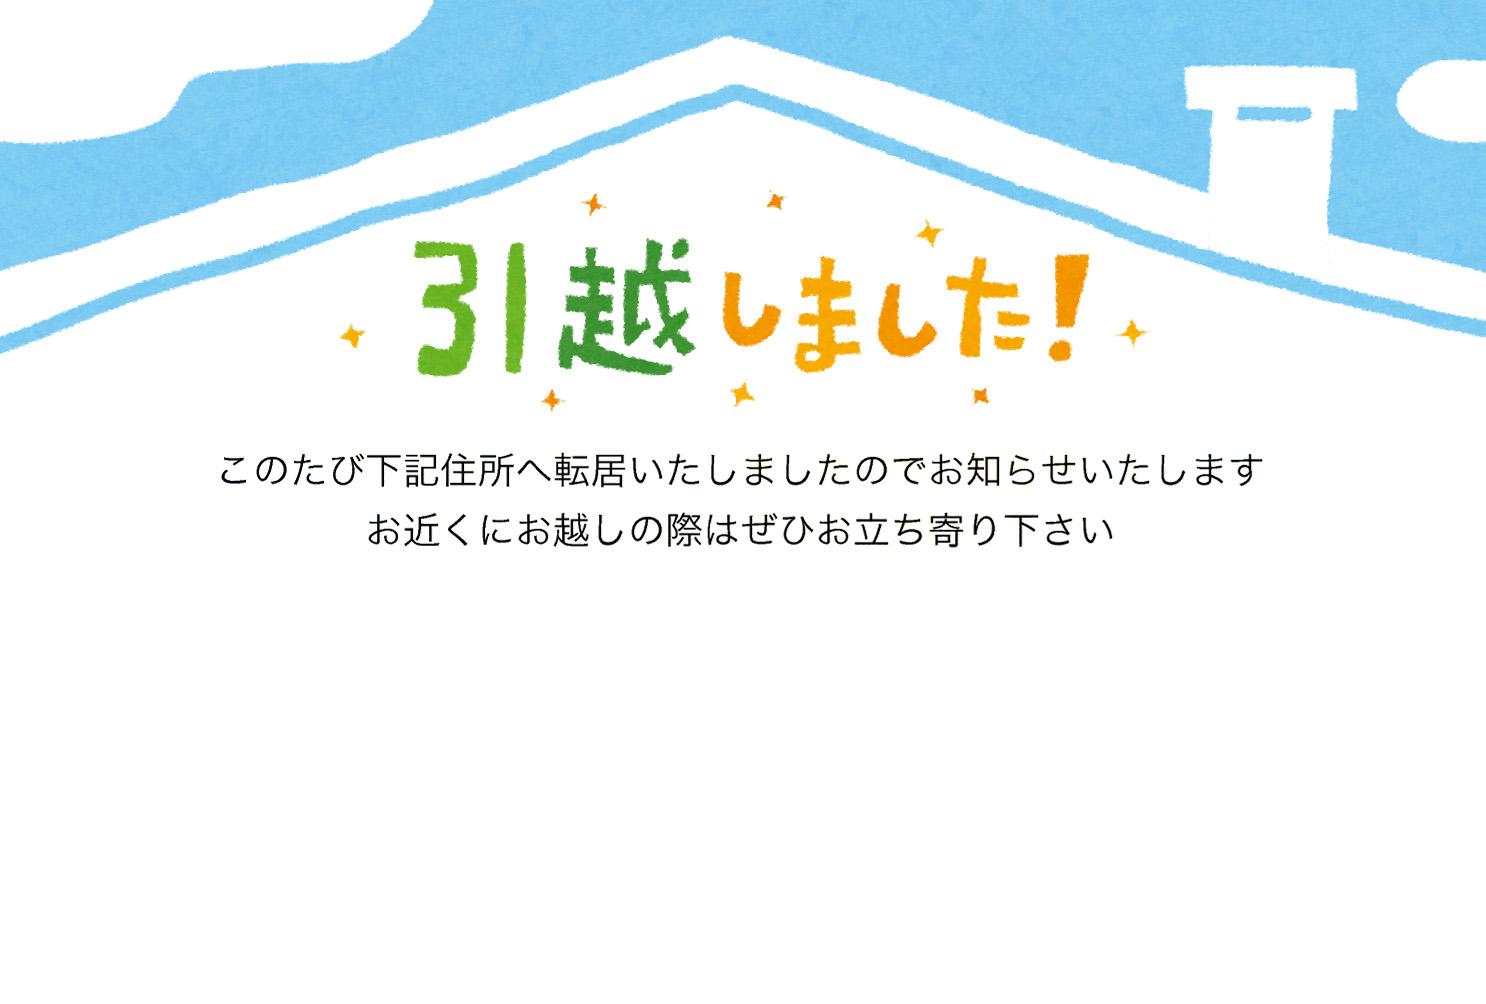 https://4.bp.blogspot.com/-58stF_mfaEg/UZNncRQ1y0I/AAAAAAAASbQ/LcwrUZNNn5w/s1600/frame_hikkoshi1_yoko.jpg